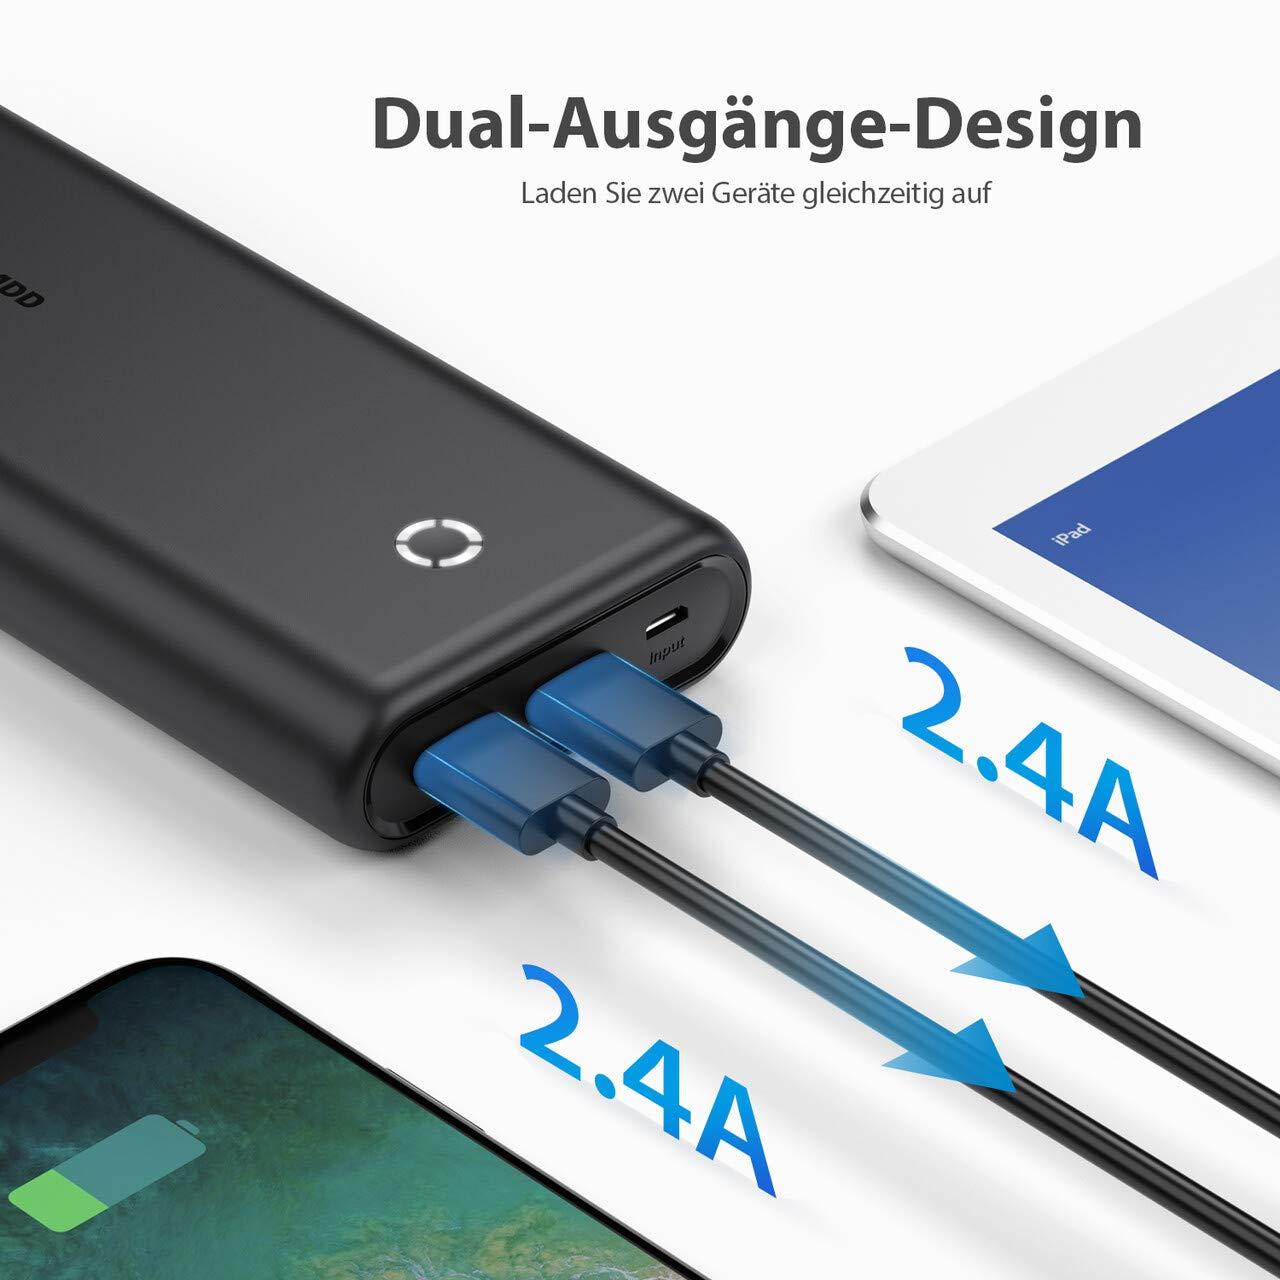 POWERADD EnergyCell 20000mah Powerbank, Power Bank für Handy, iPhone, iPad, Samsung Galaxy Huawei und weitere Smartphones